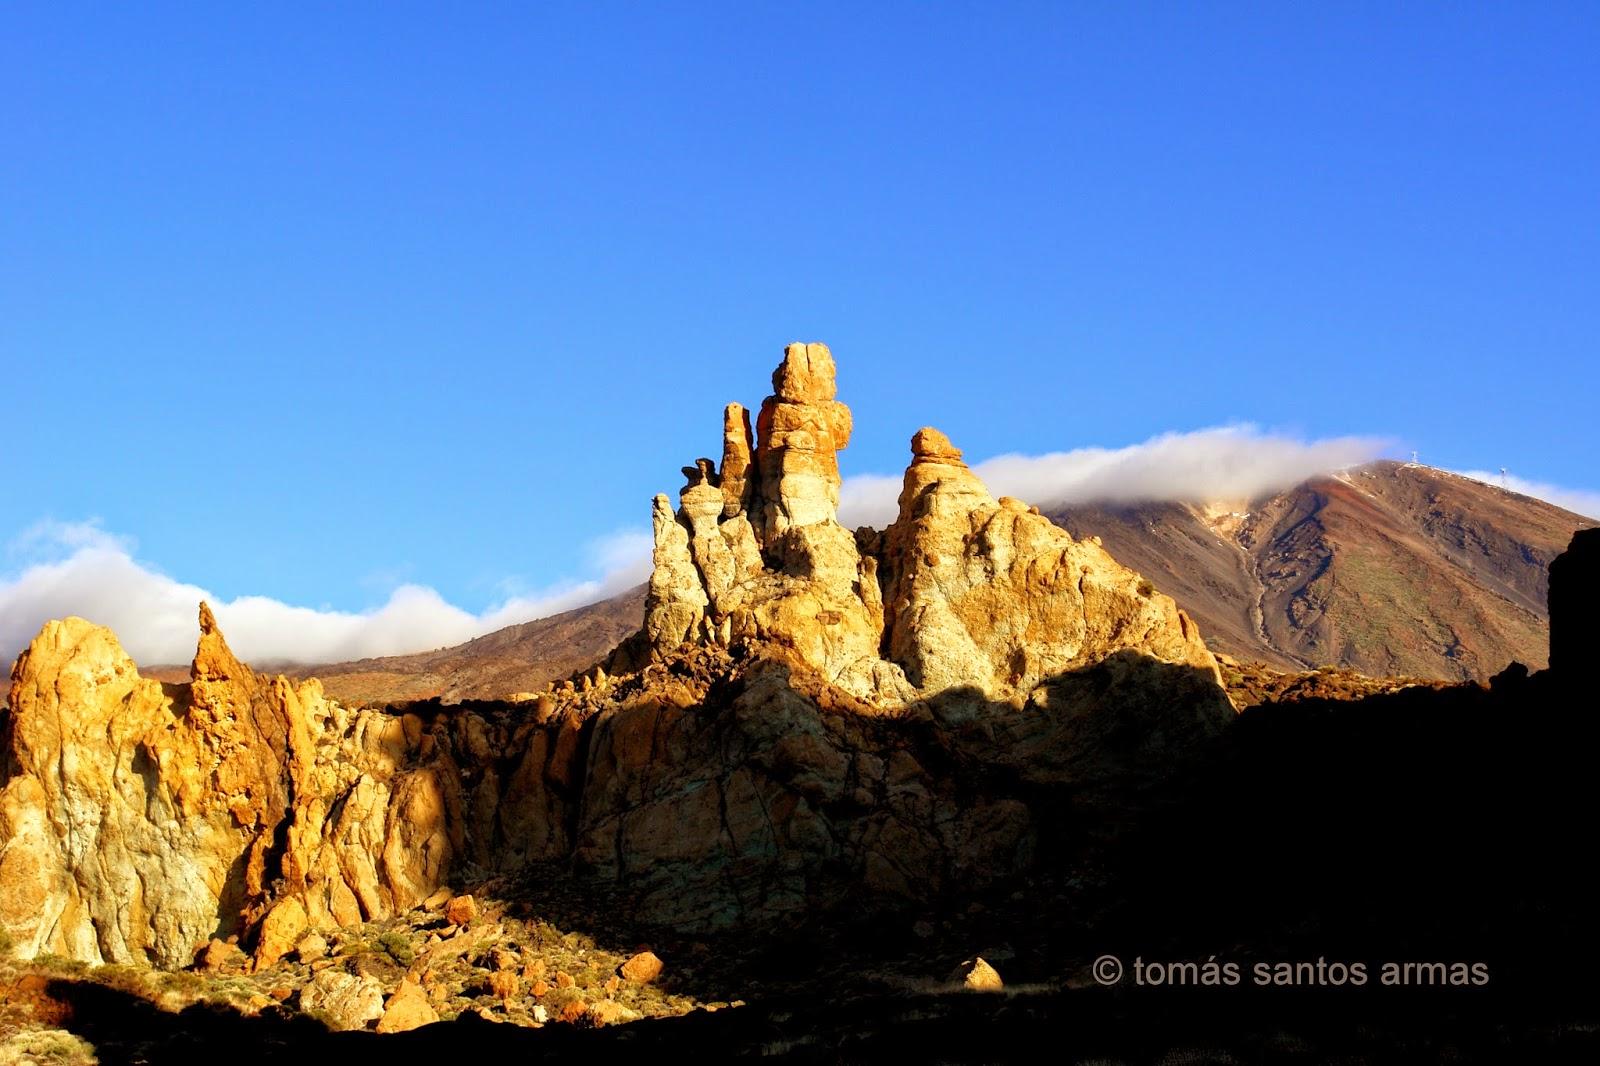 Tenerife senderos tenerife senderos ucanca roques de garc a ucanca - Azulejos tenerife ...